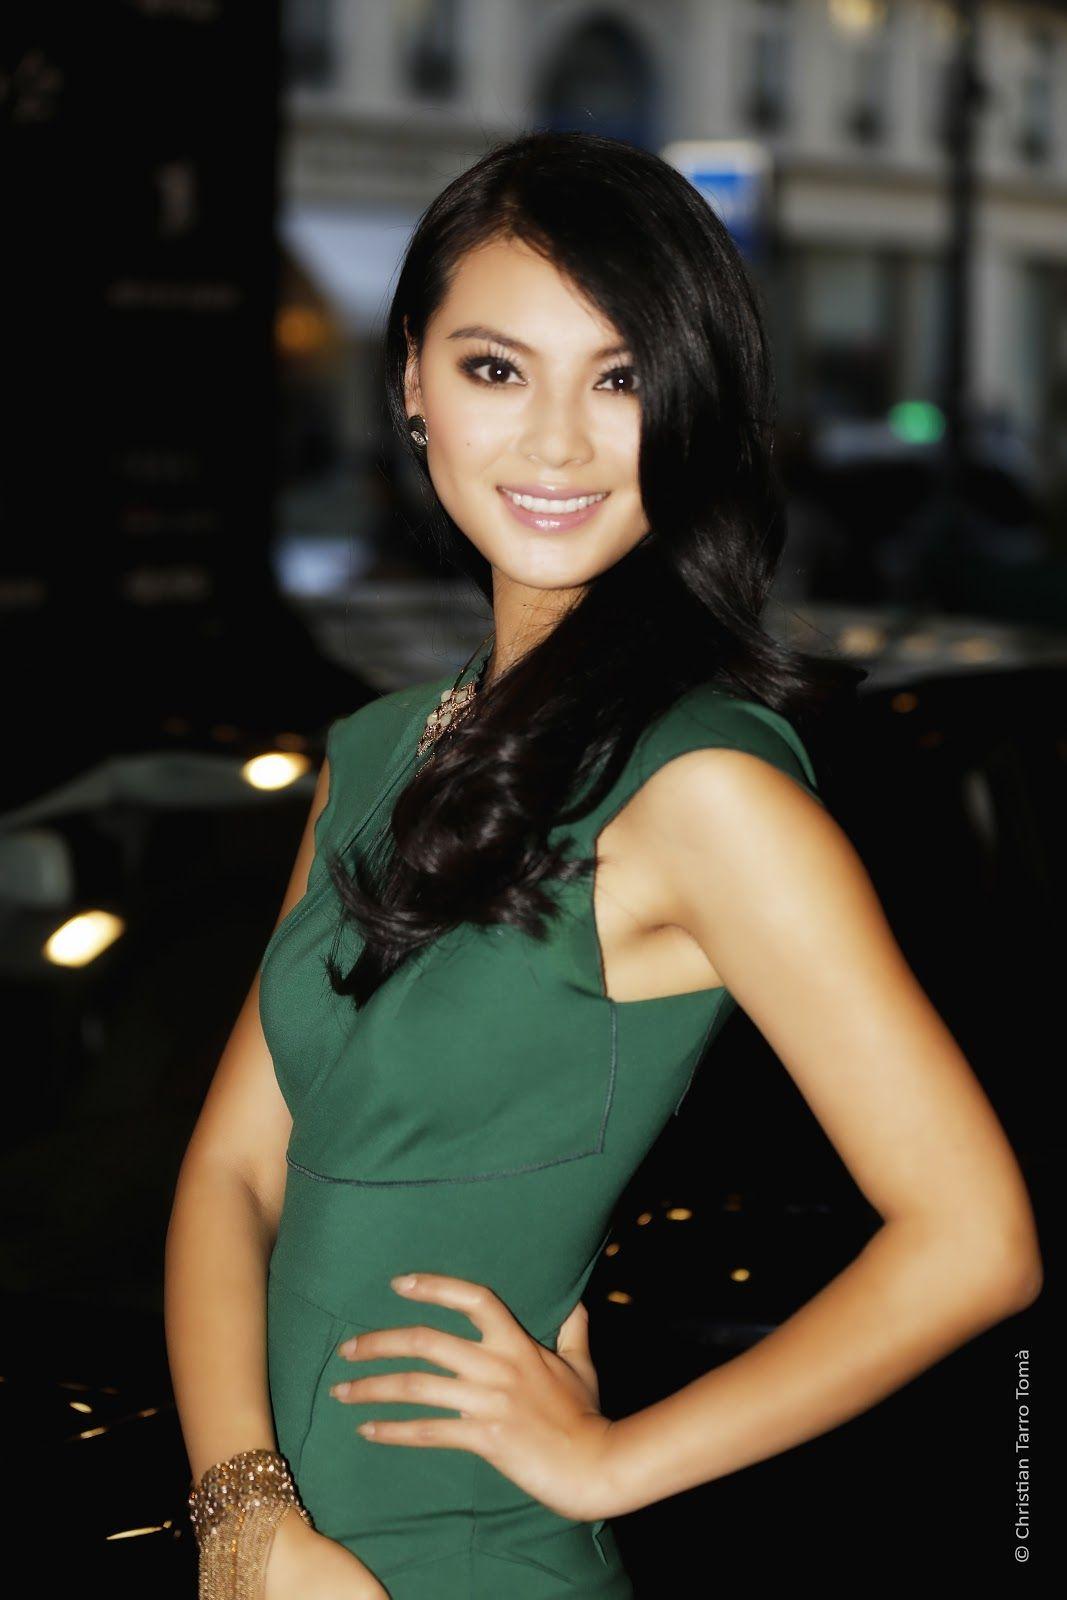 wenxia yu, miss world 2012.  03dee110